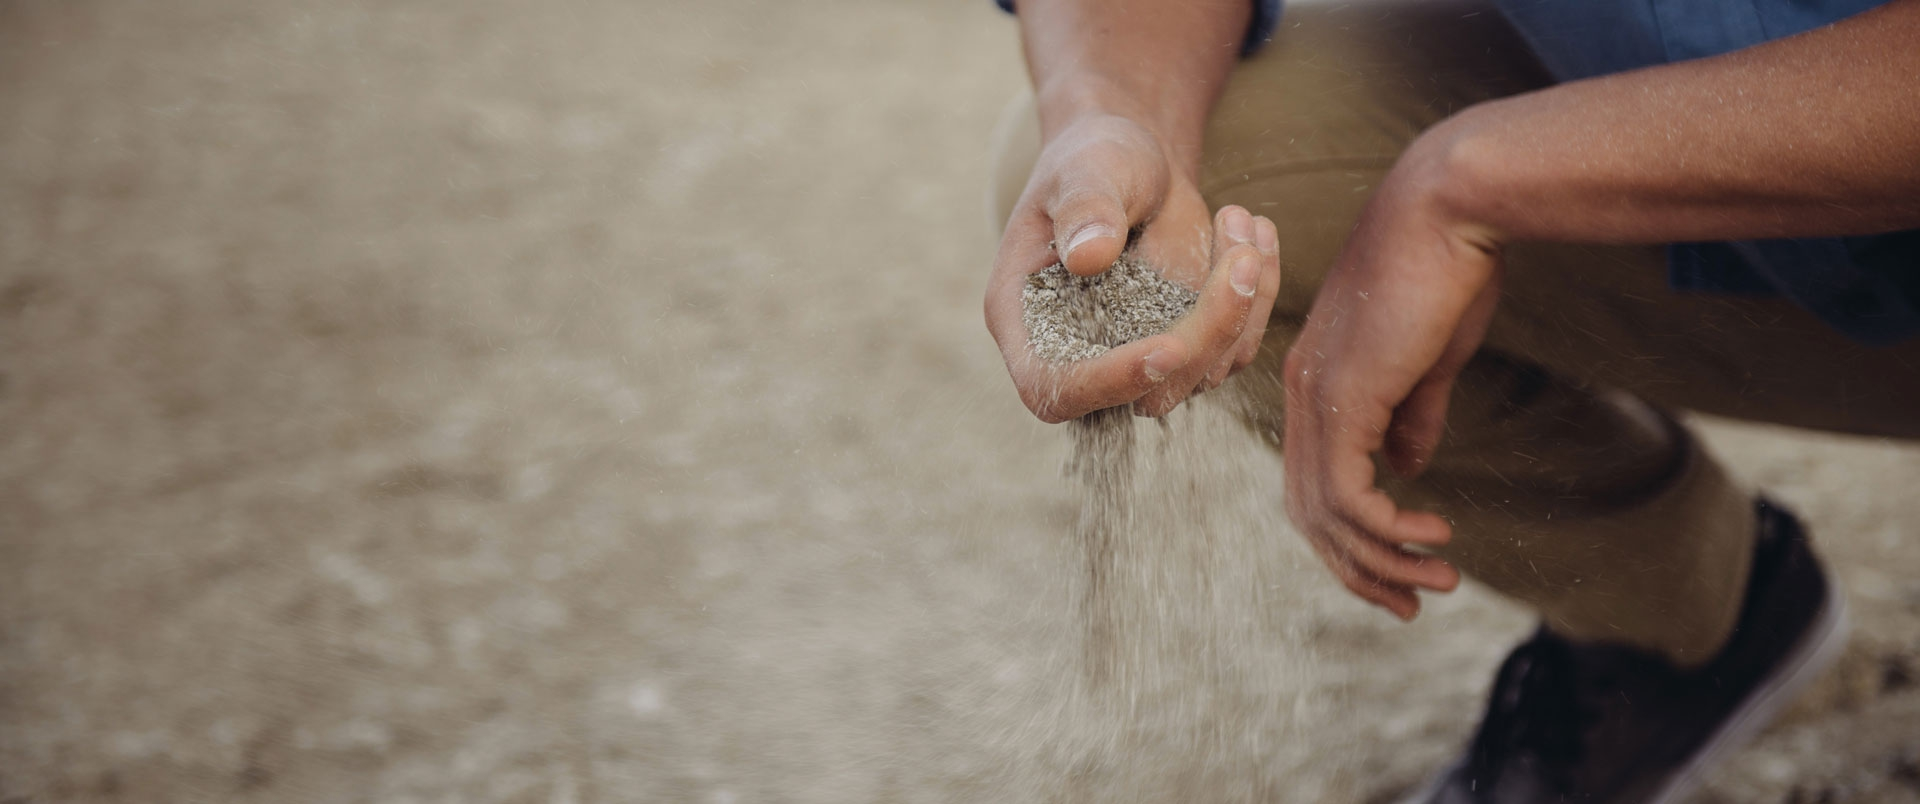 hemp is sustainable, cbd natural